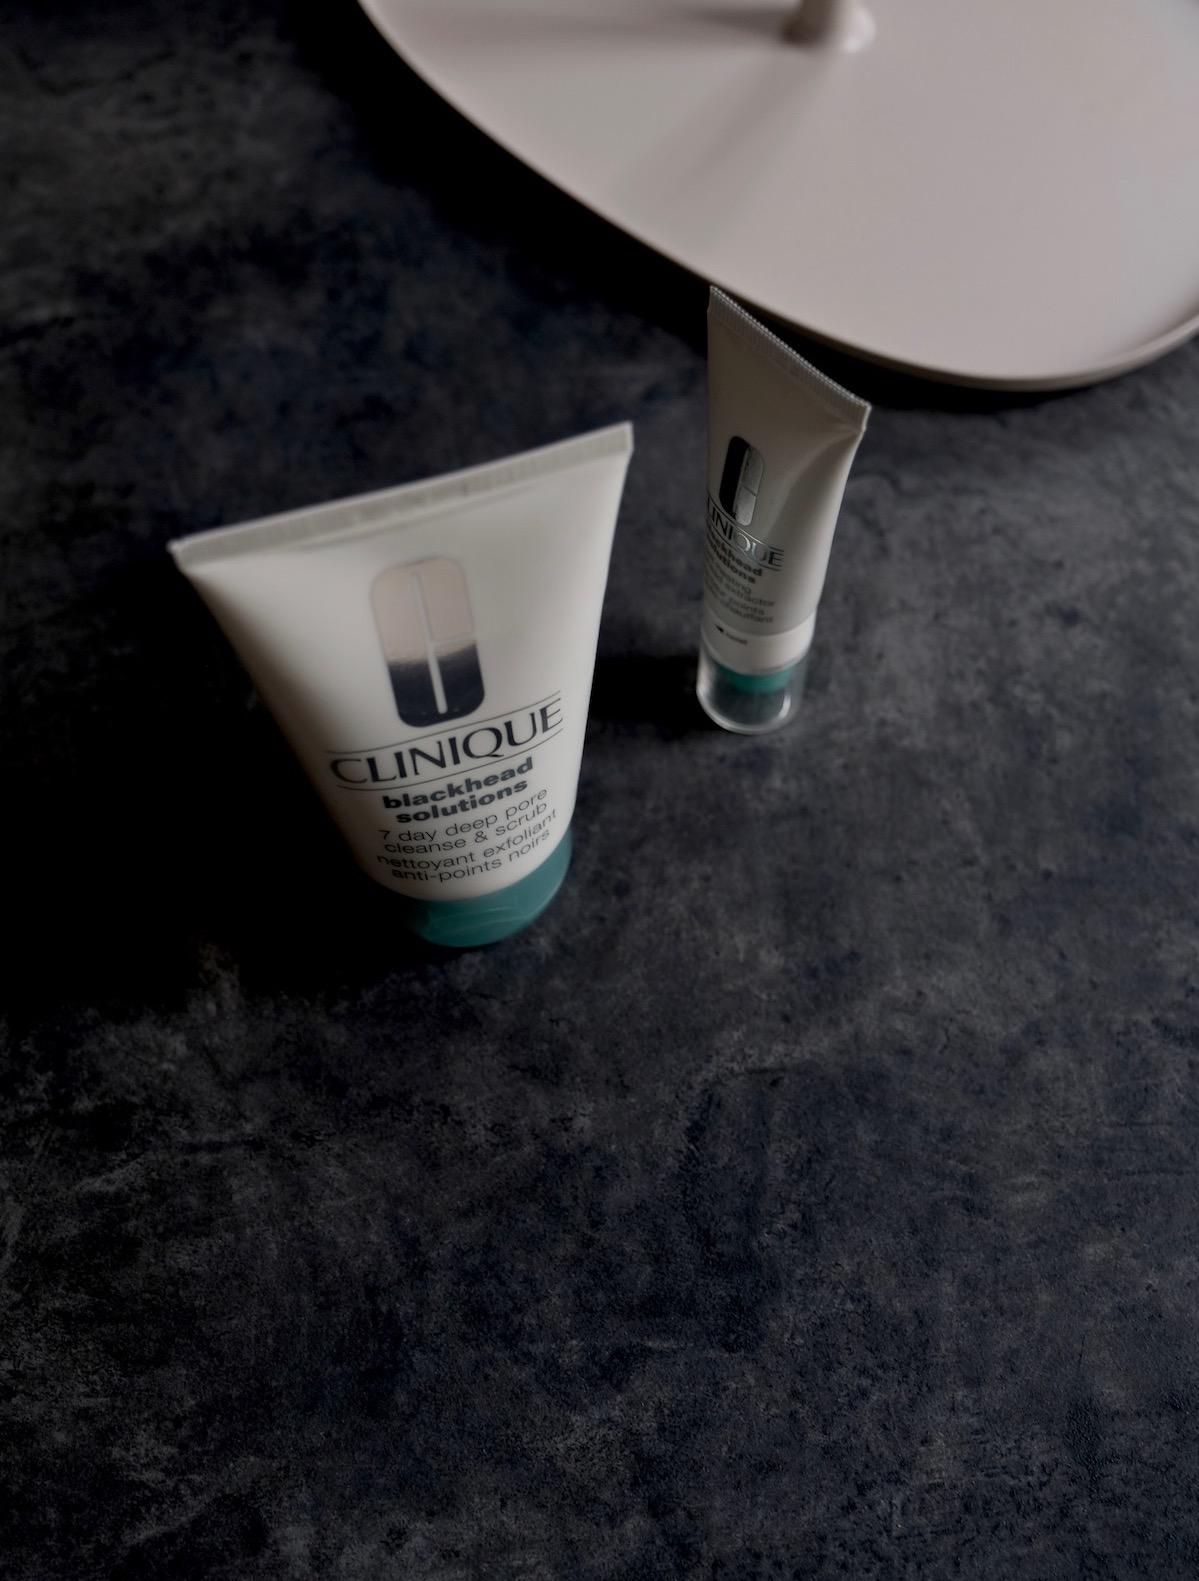 Beautyblog Elina Neumann Clinique Blackhead Solution Review